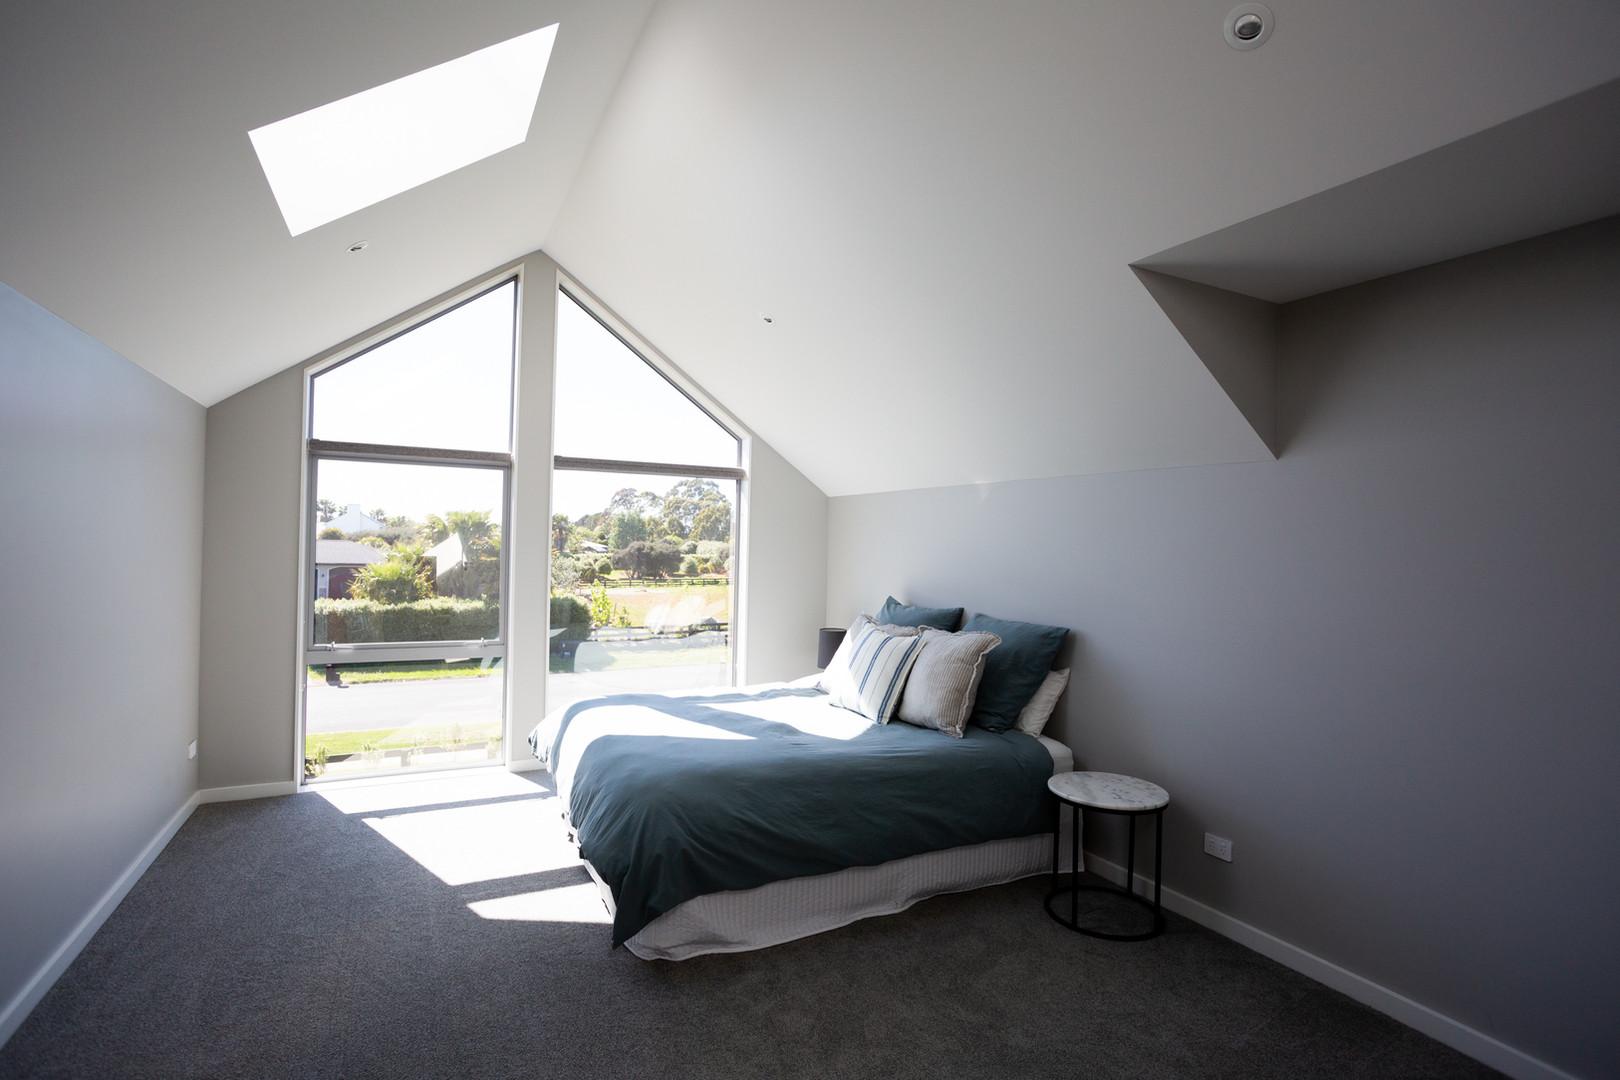 Upstairs loft room with skylight